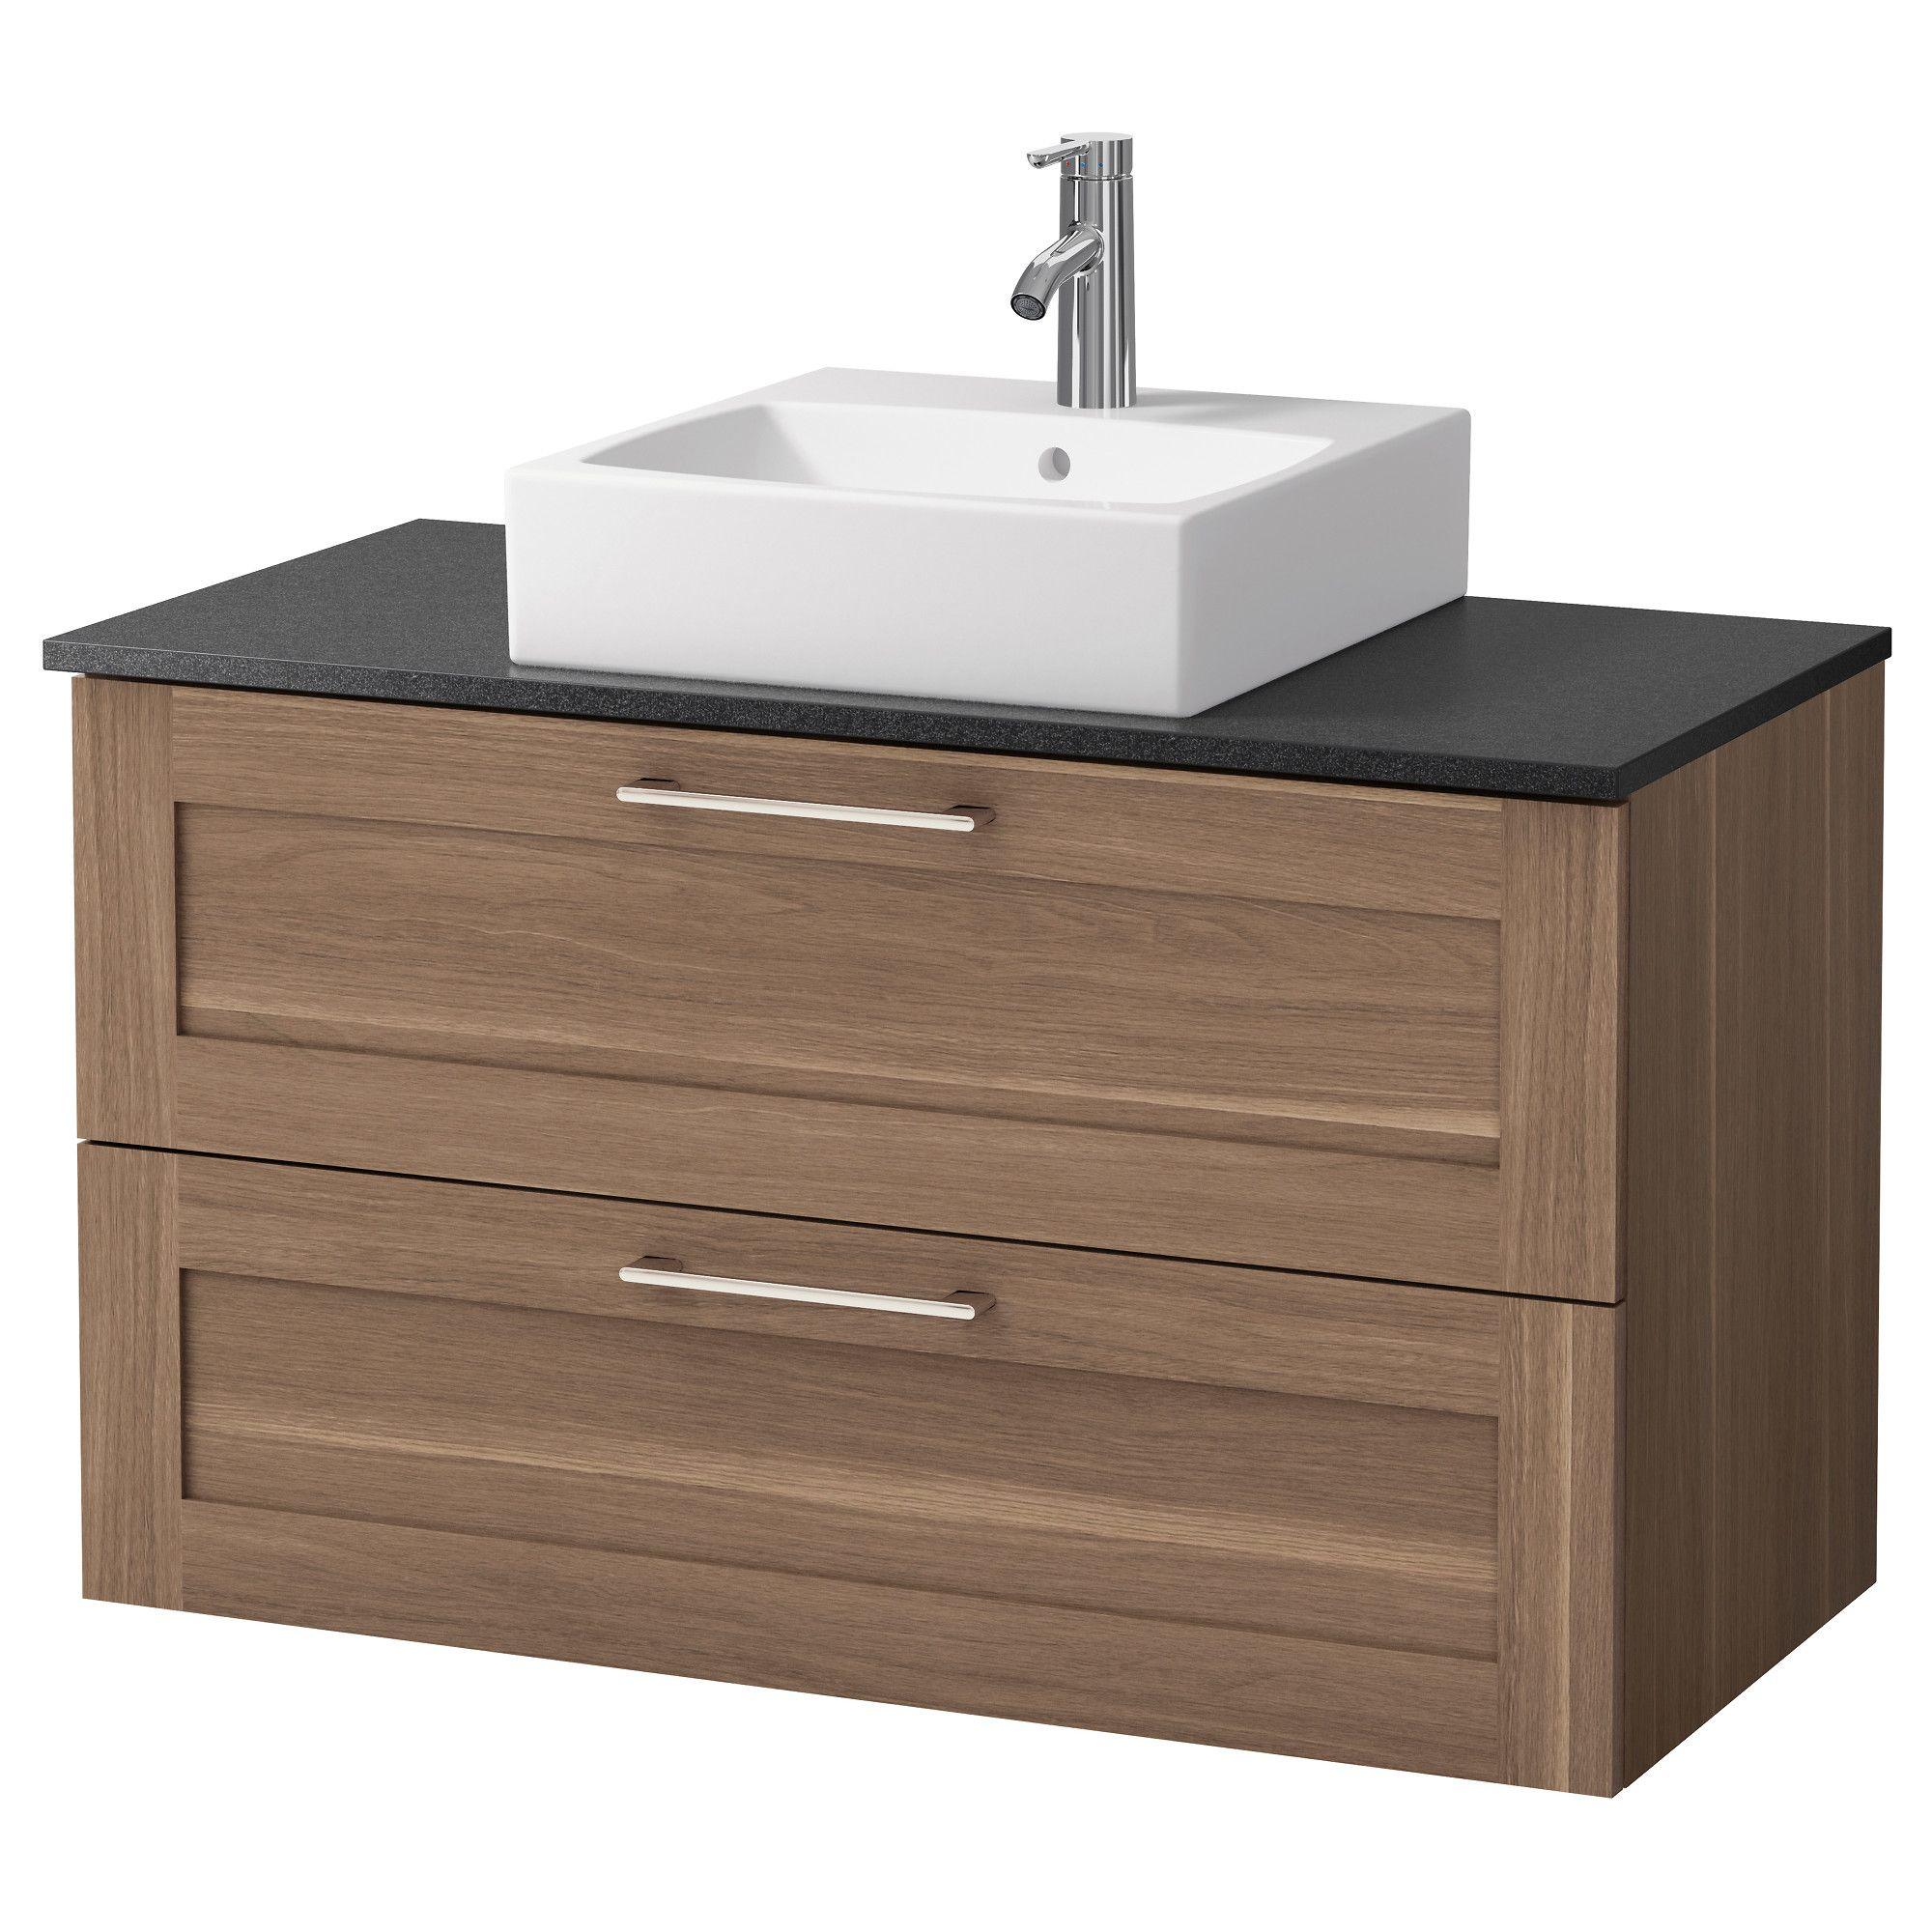 Furniture And Home Furnishings Products Ikea Bathroom